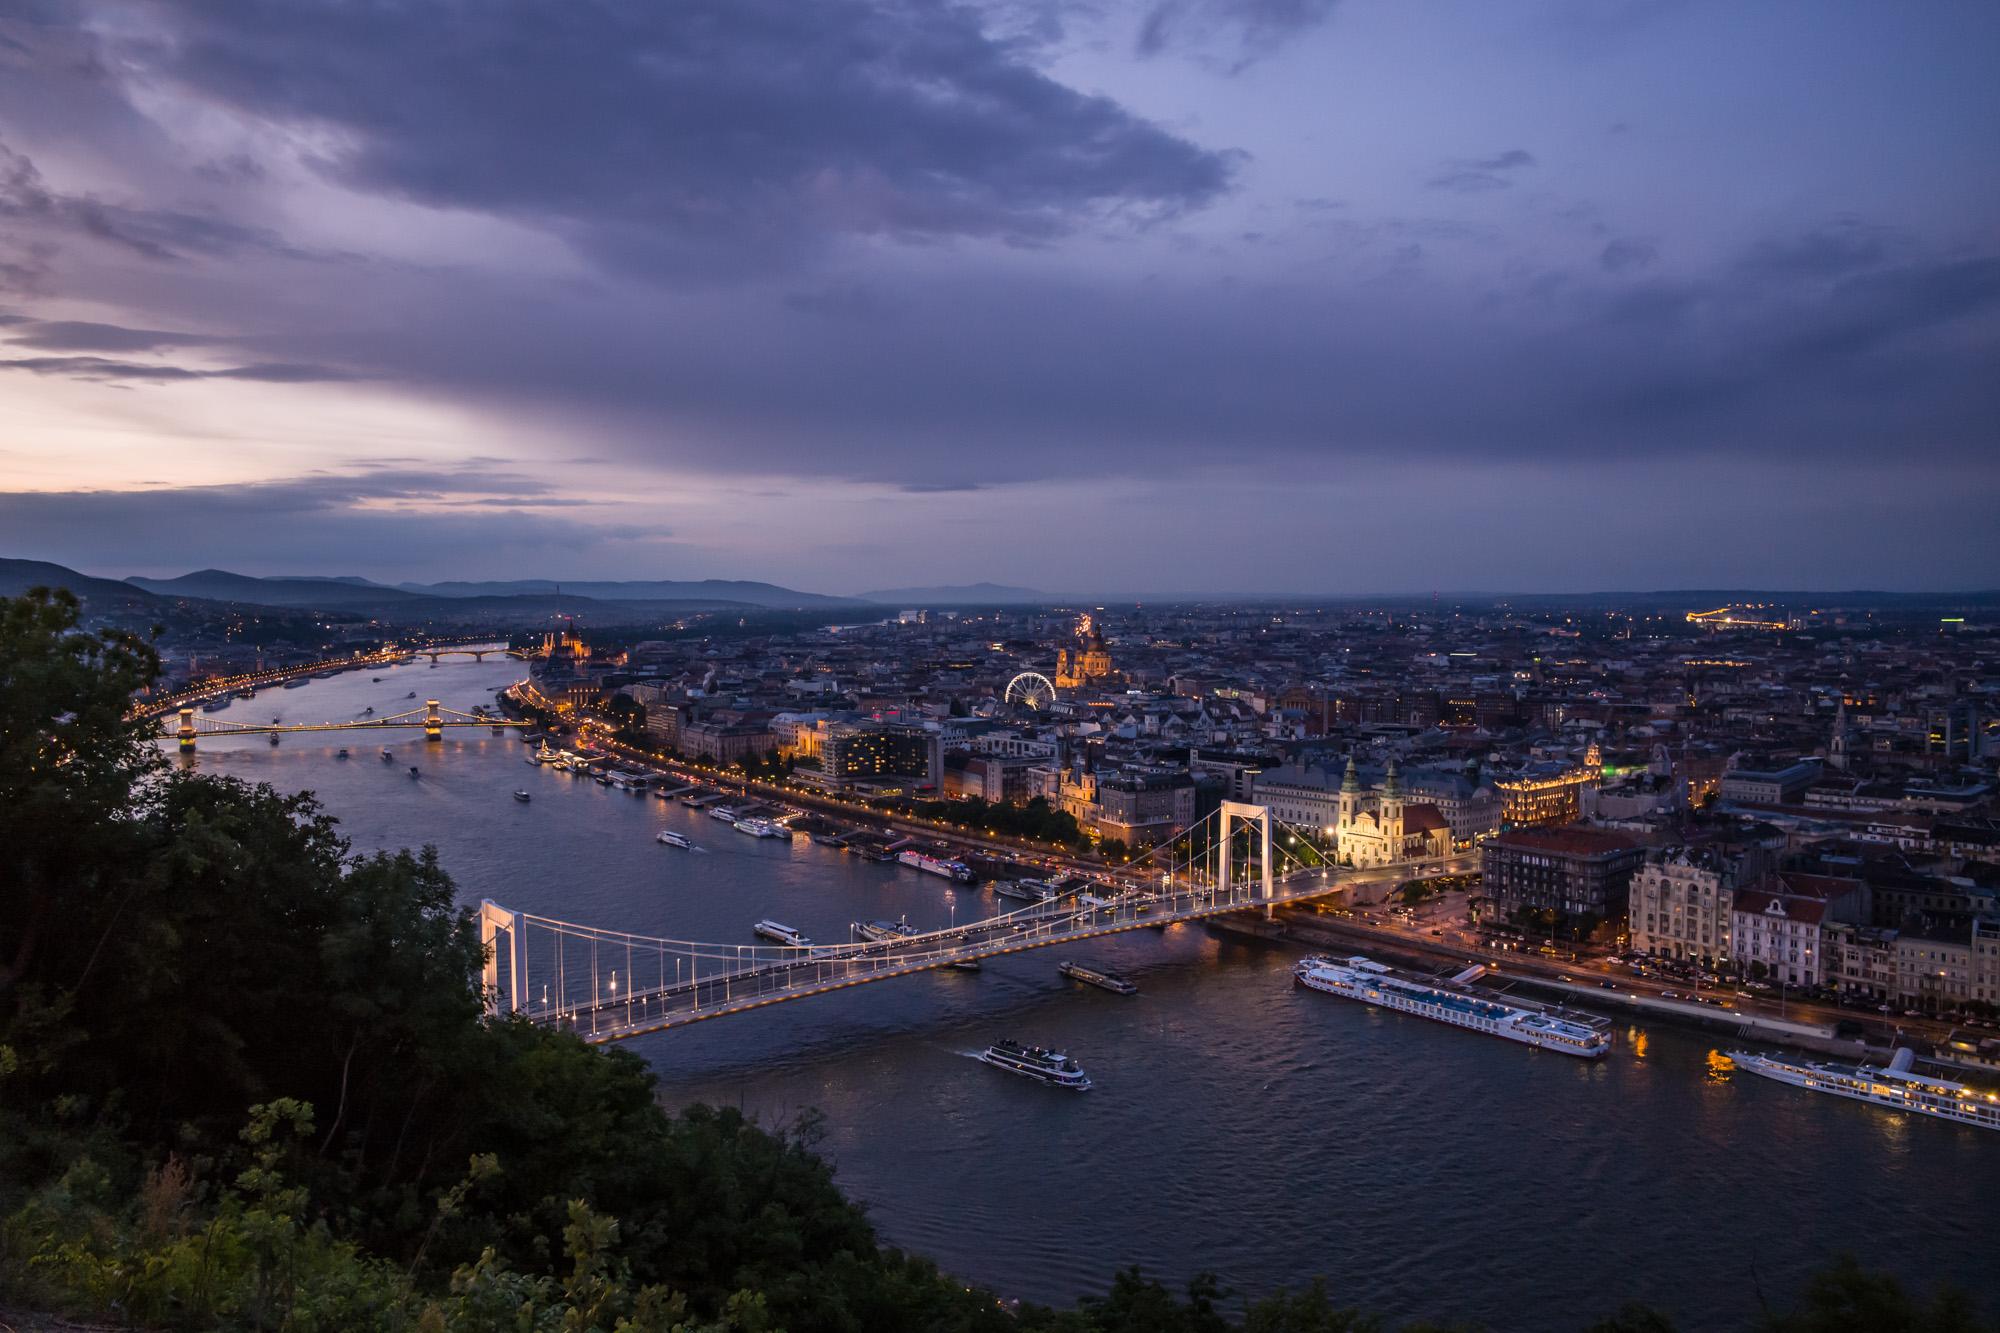 Bridge over the Danube at night